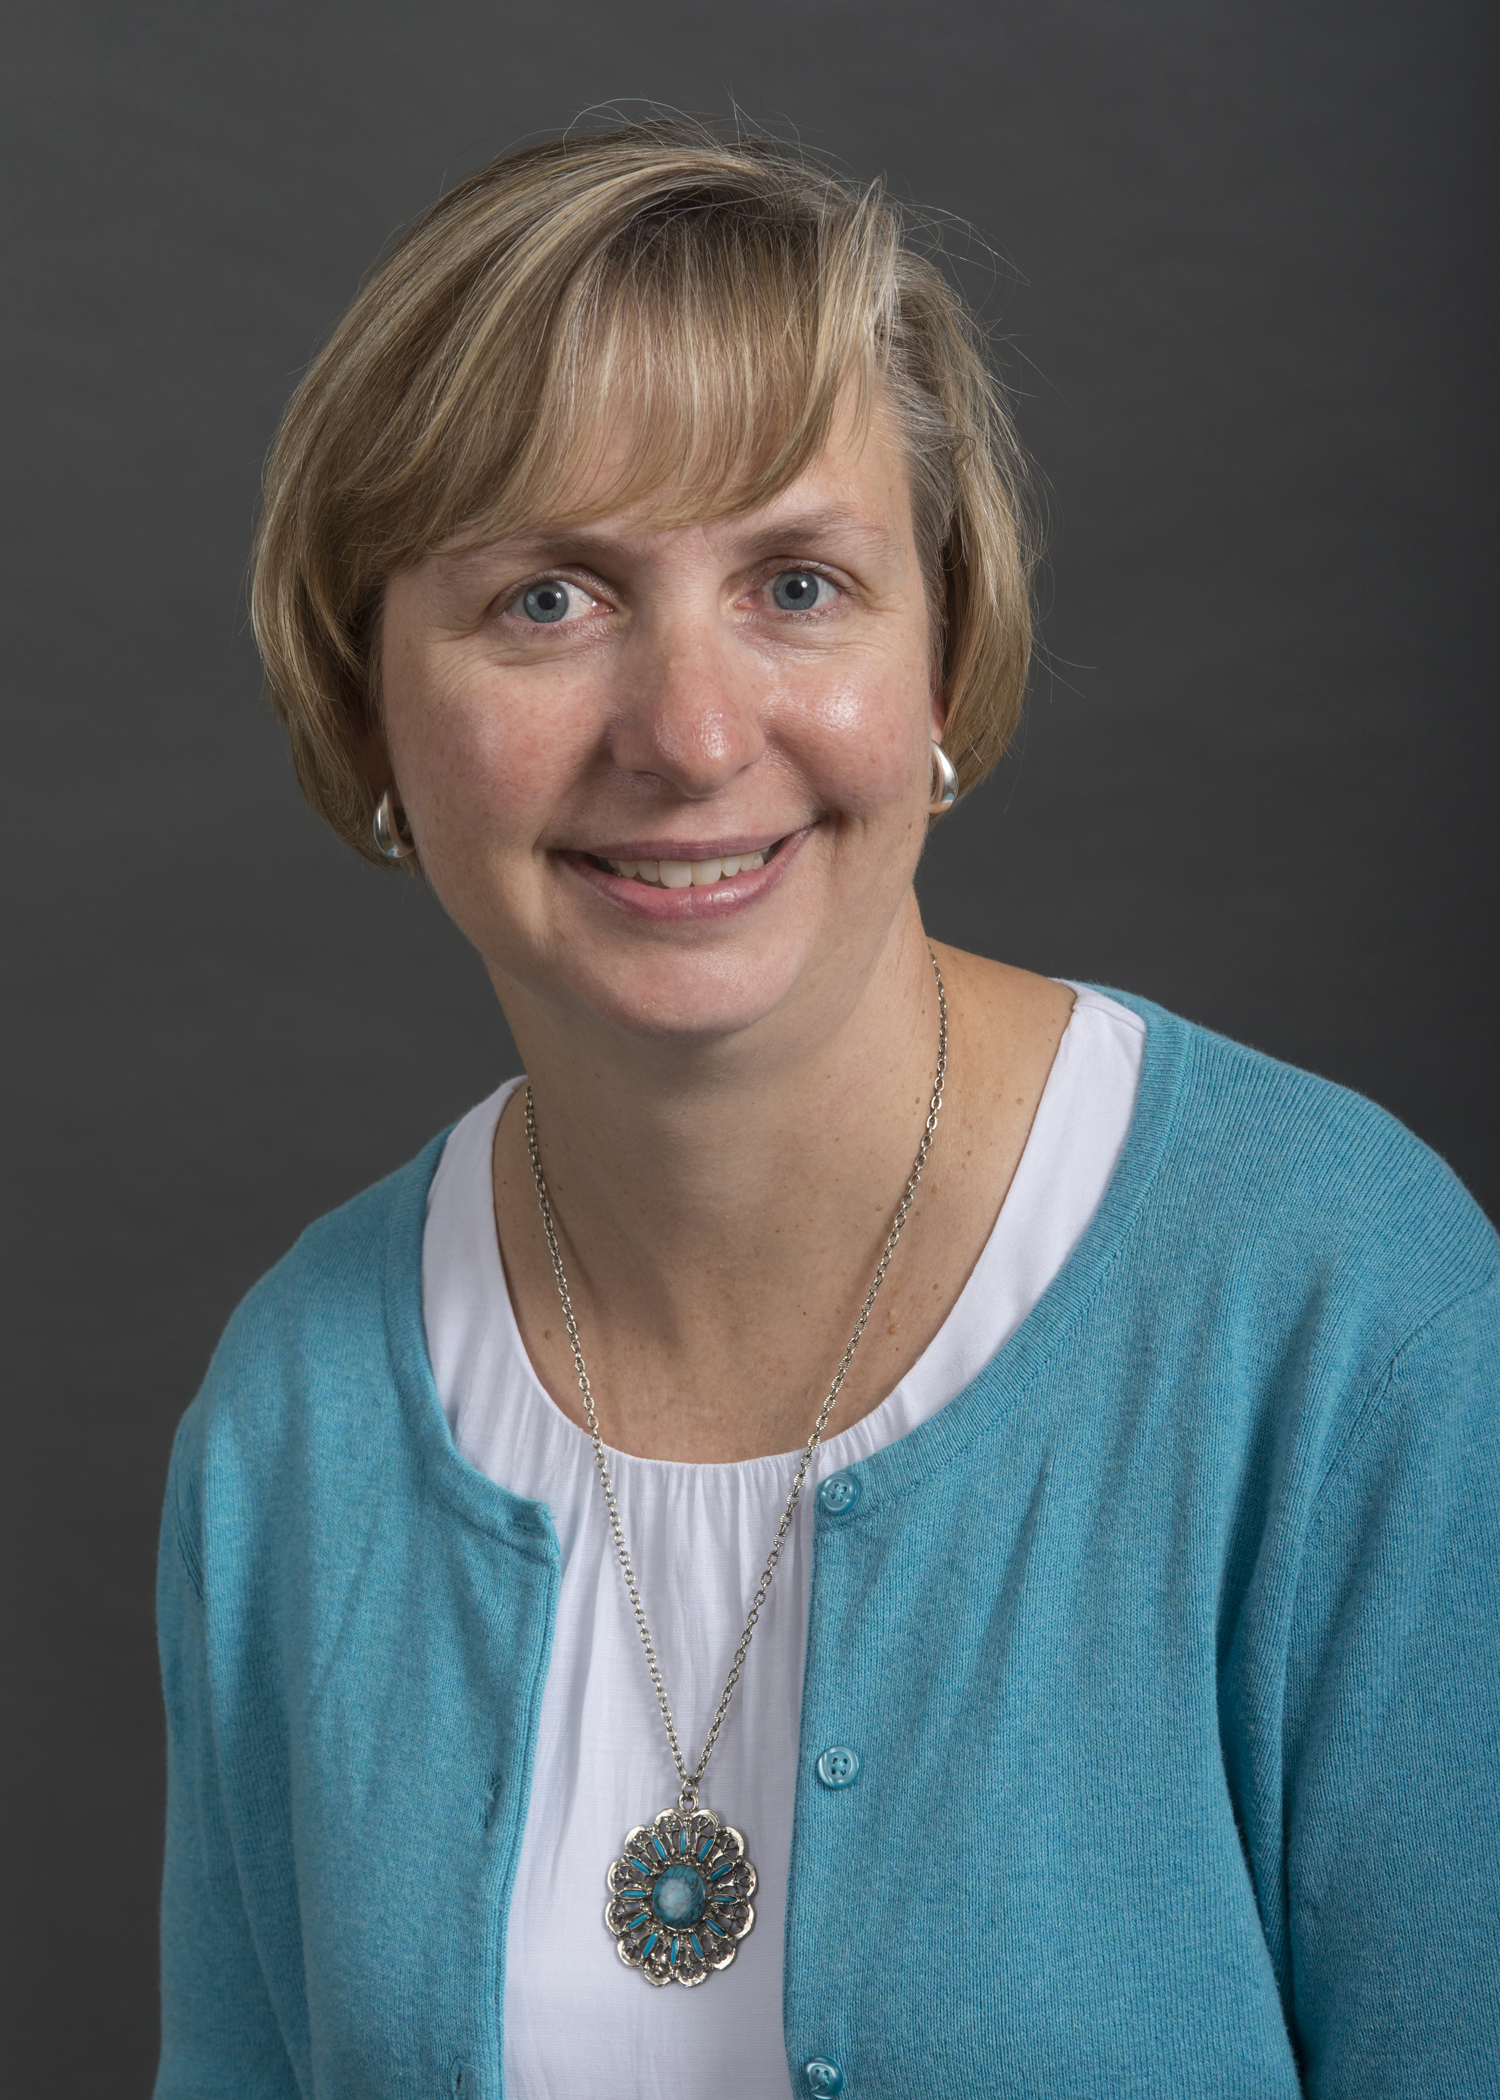 Photo of Diane Rohlman, M.A., Ph.D.